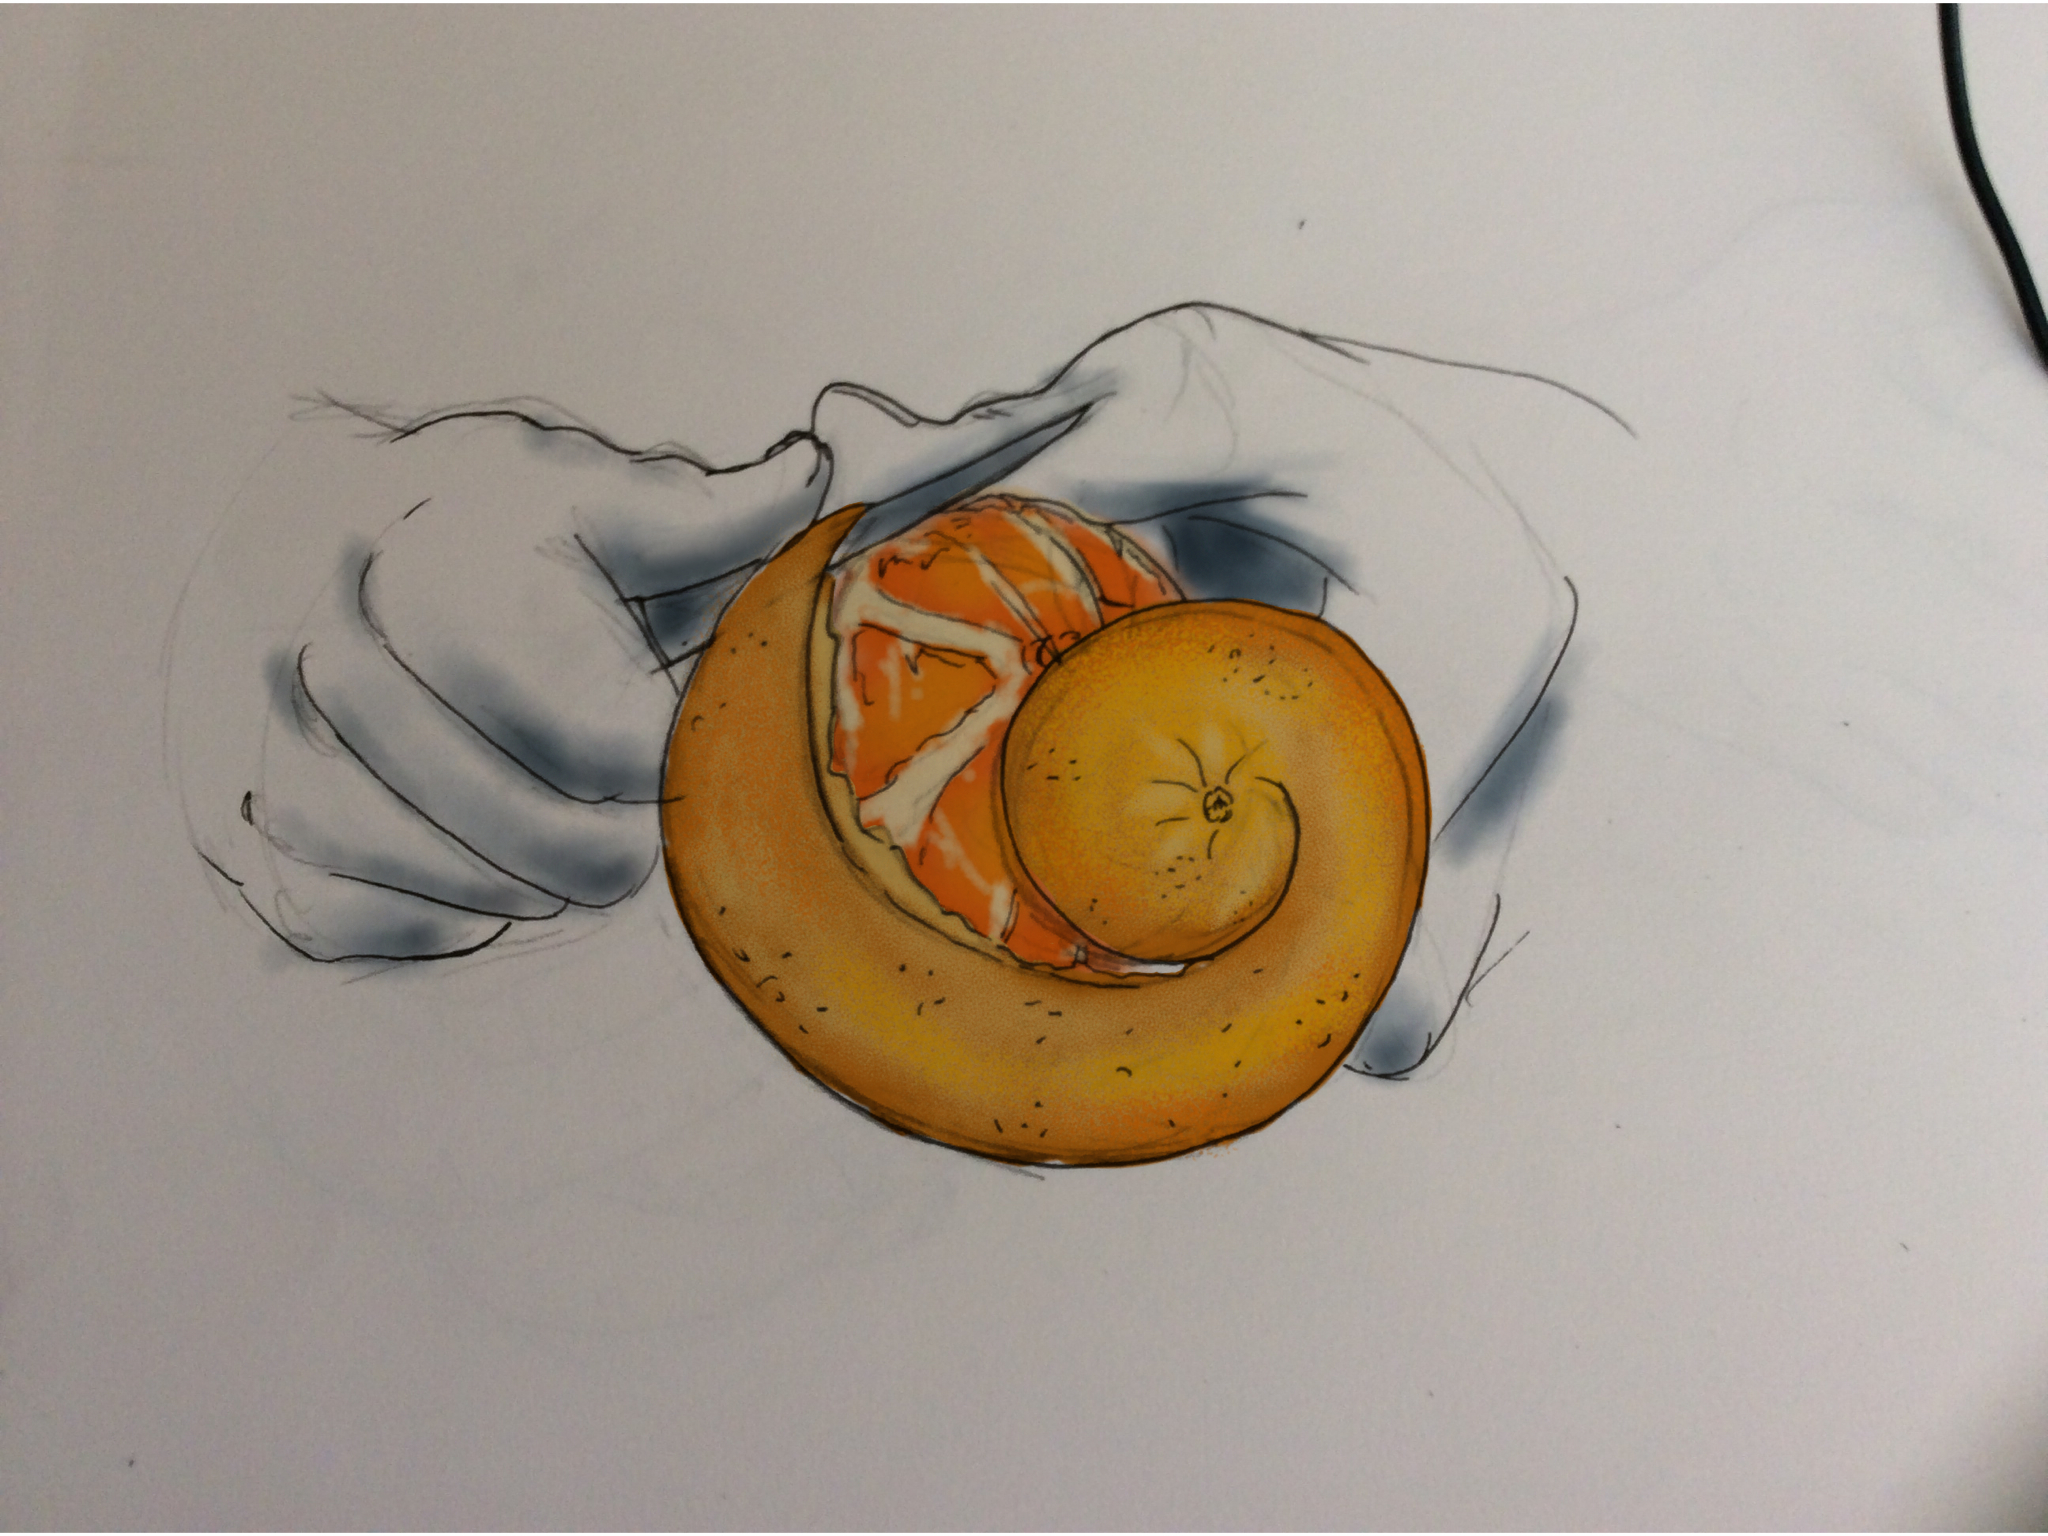 Peeling the orange by InPBo